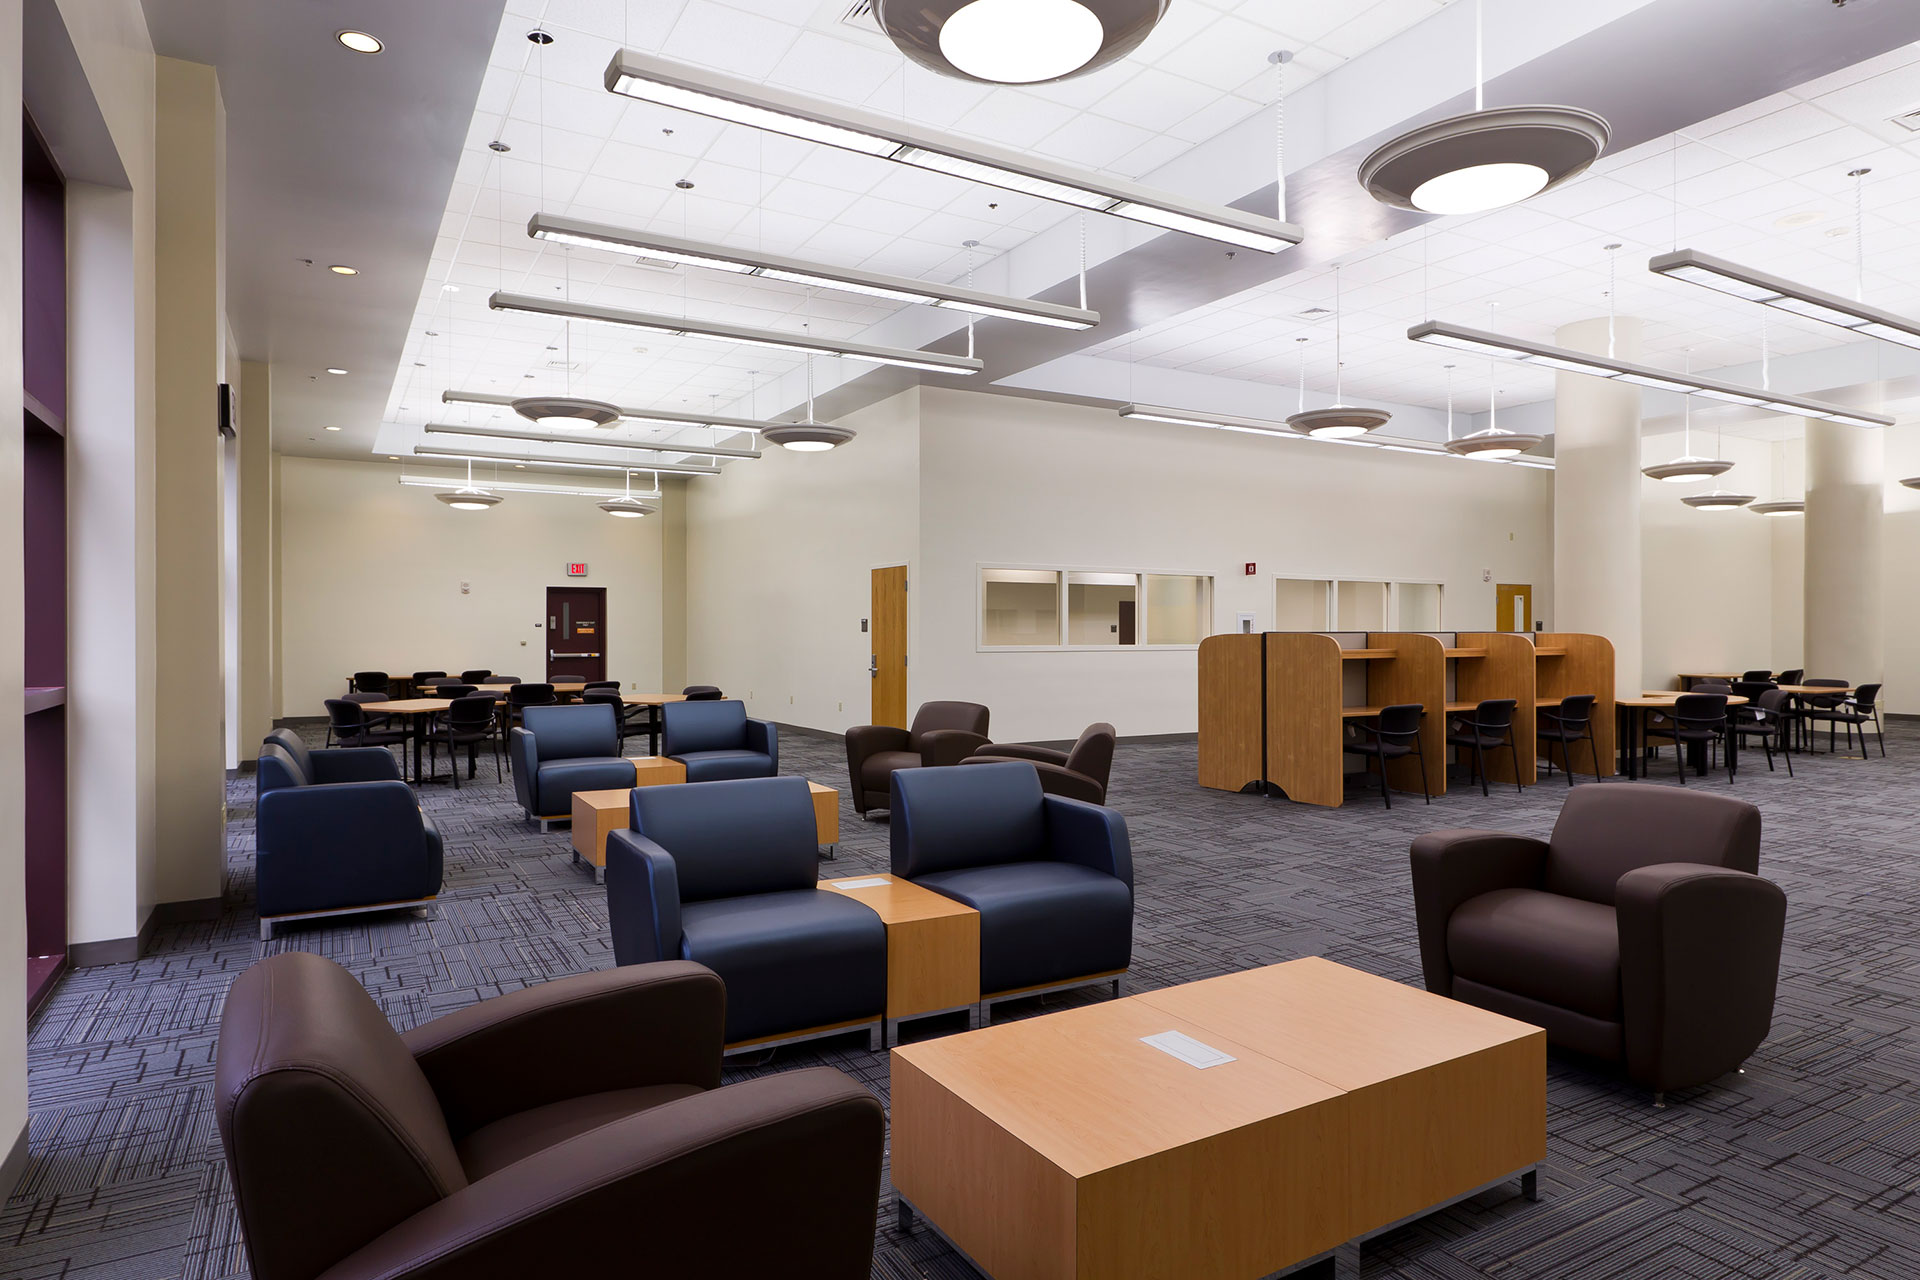 Marston Library Uf Study Rooms